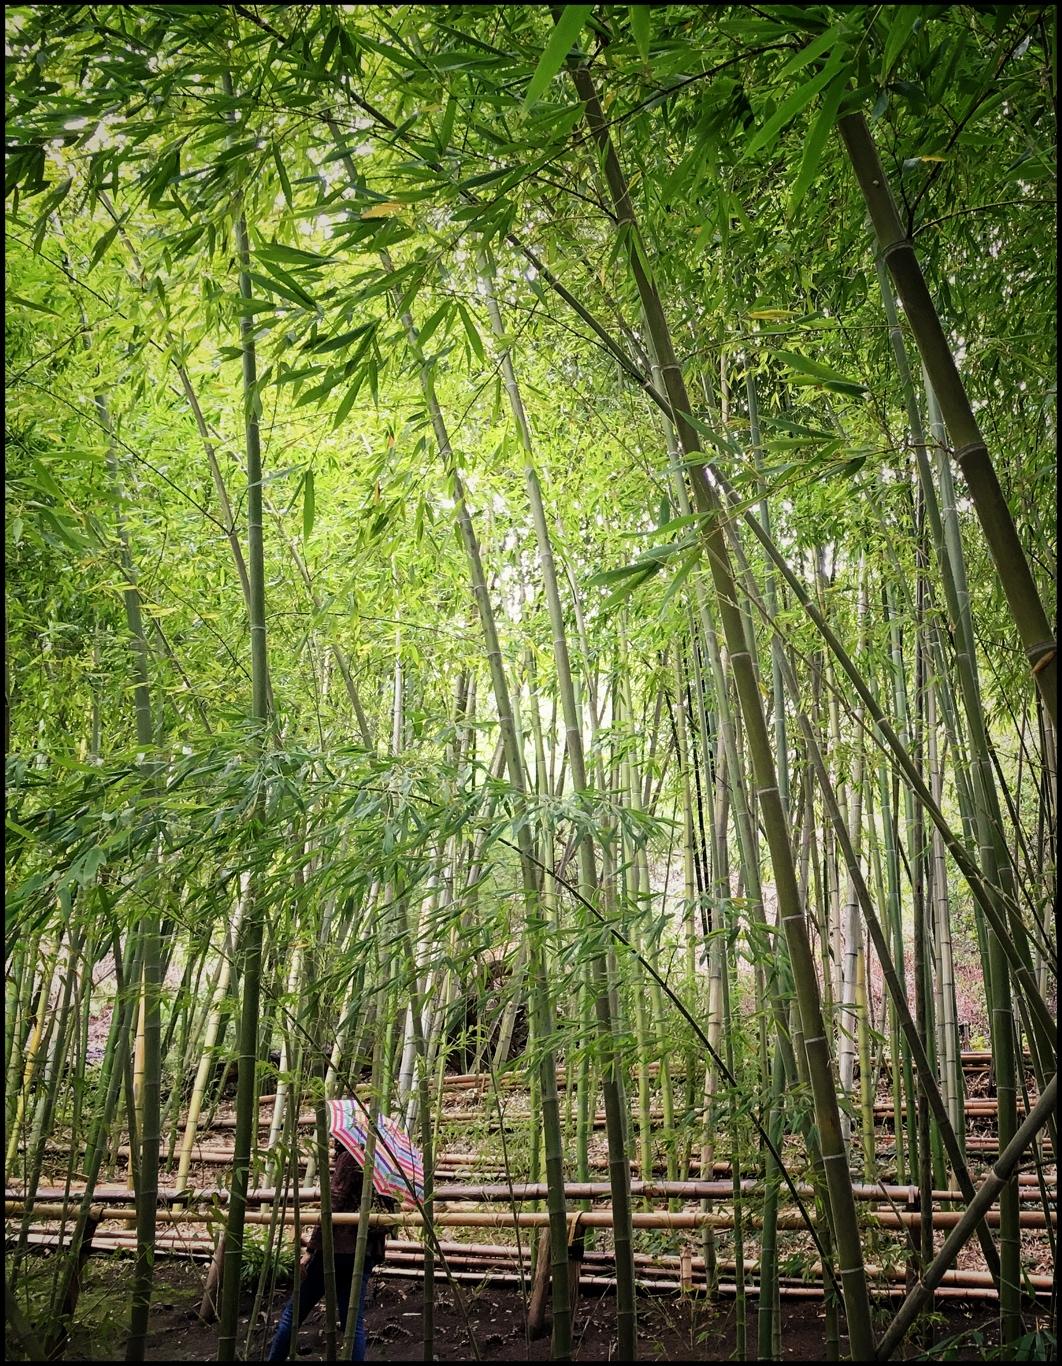 Umbrella in bamboo grove by Becky Jaffe.jpeg